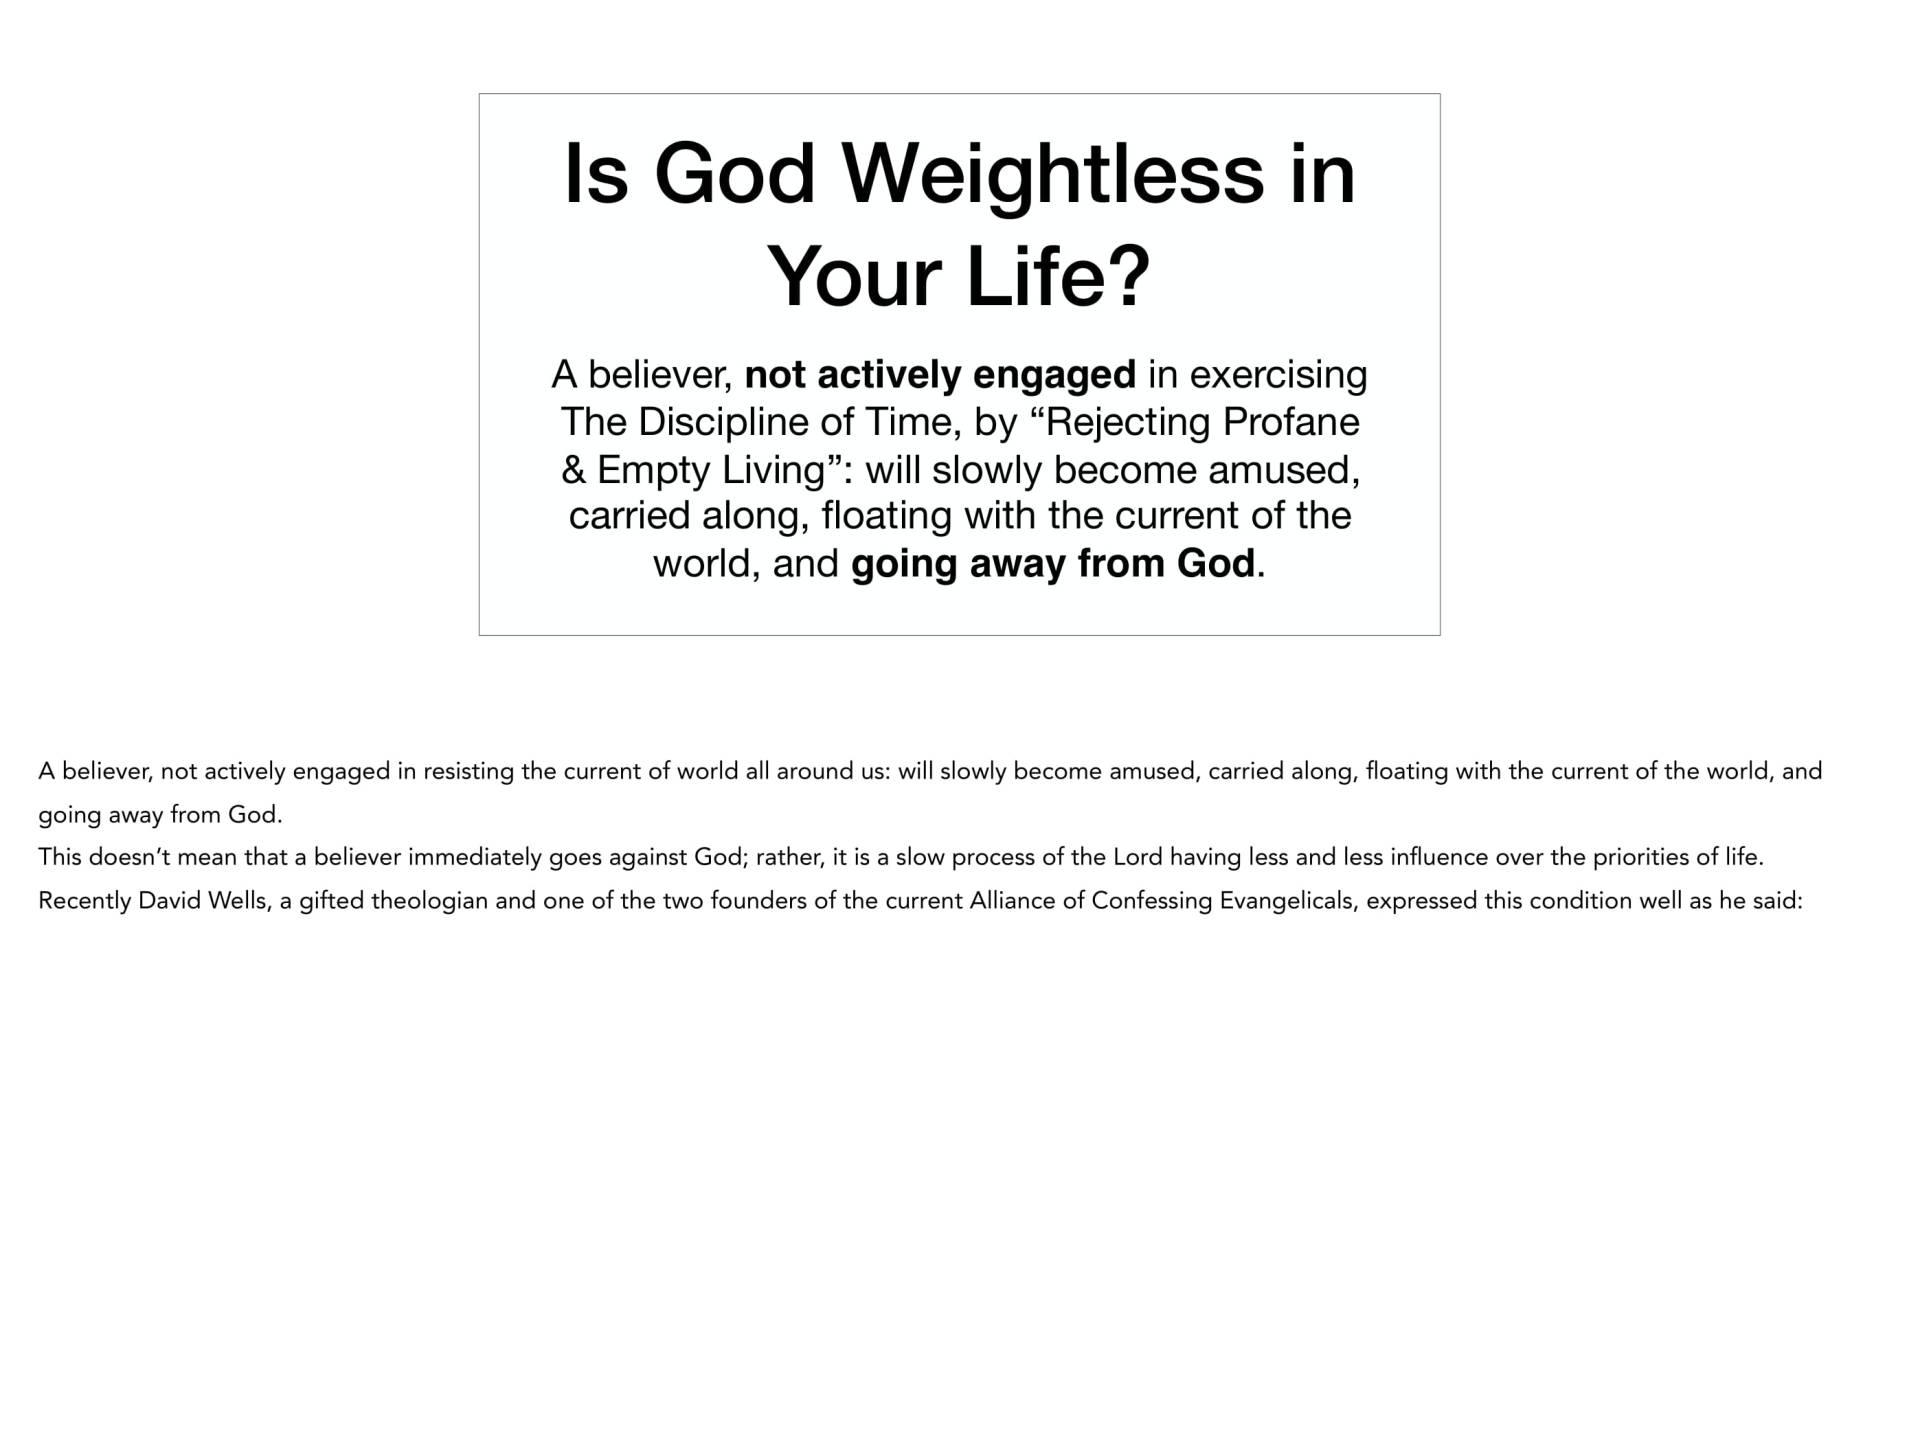 LGI-02 - Men & Husbands Beware Of Weightlessness-09